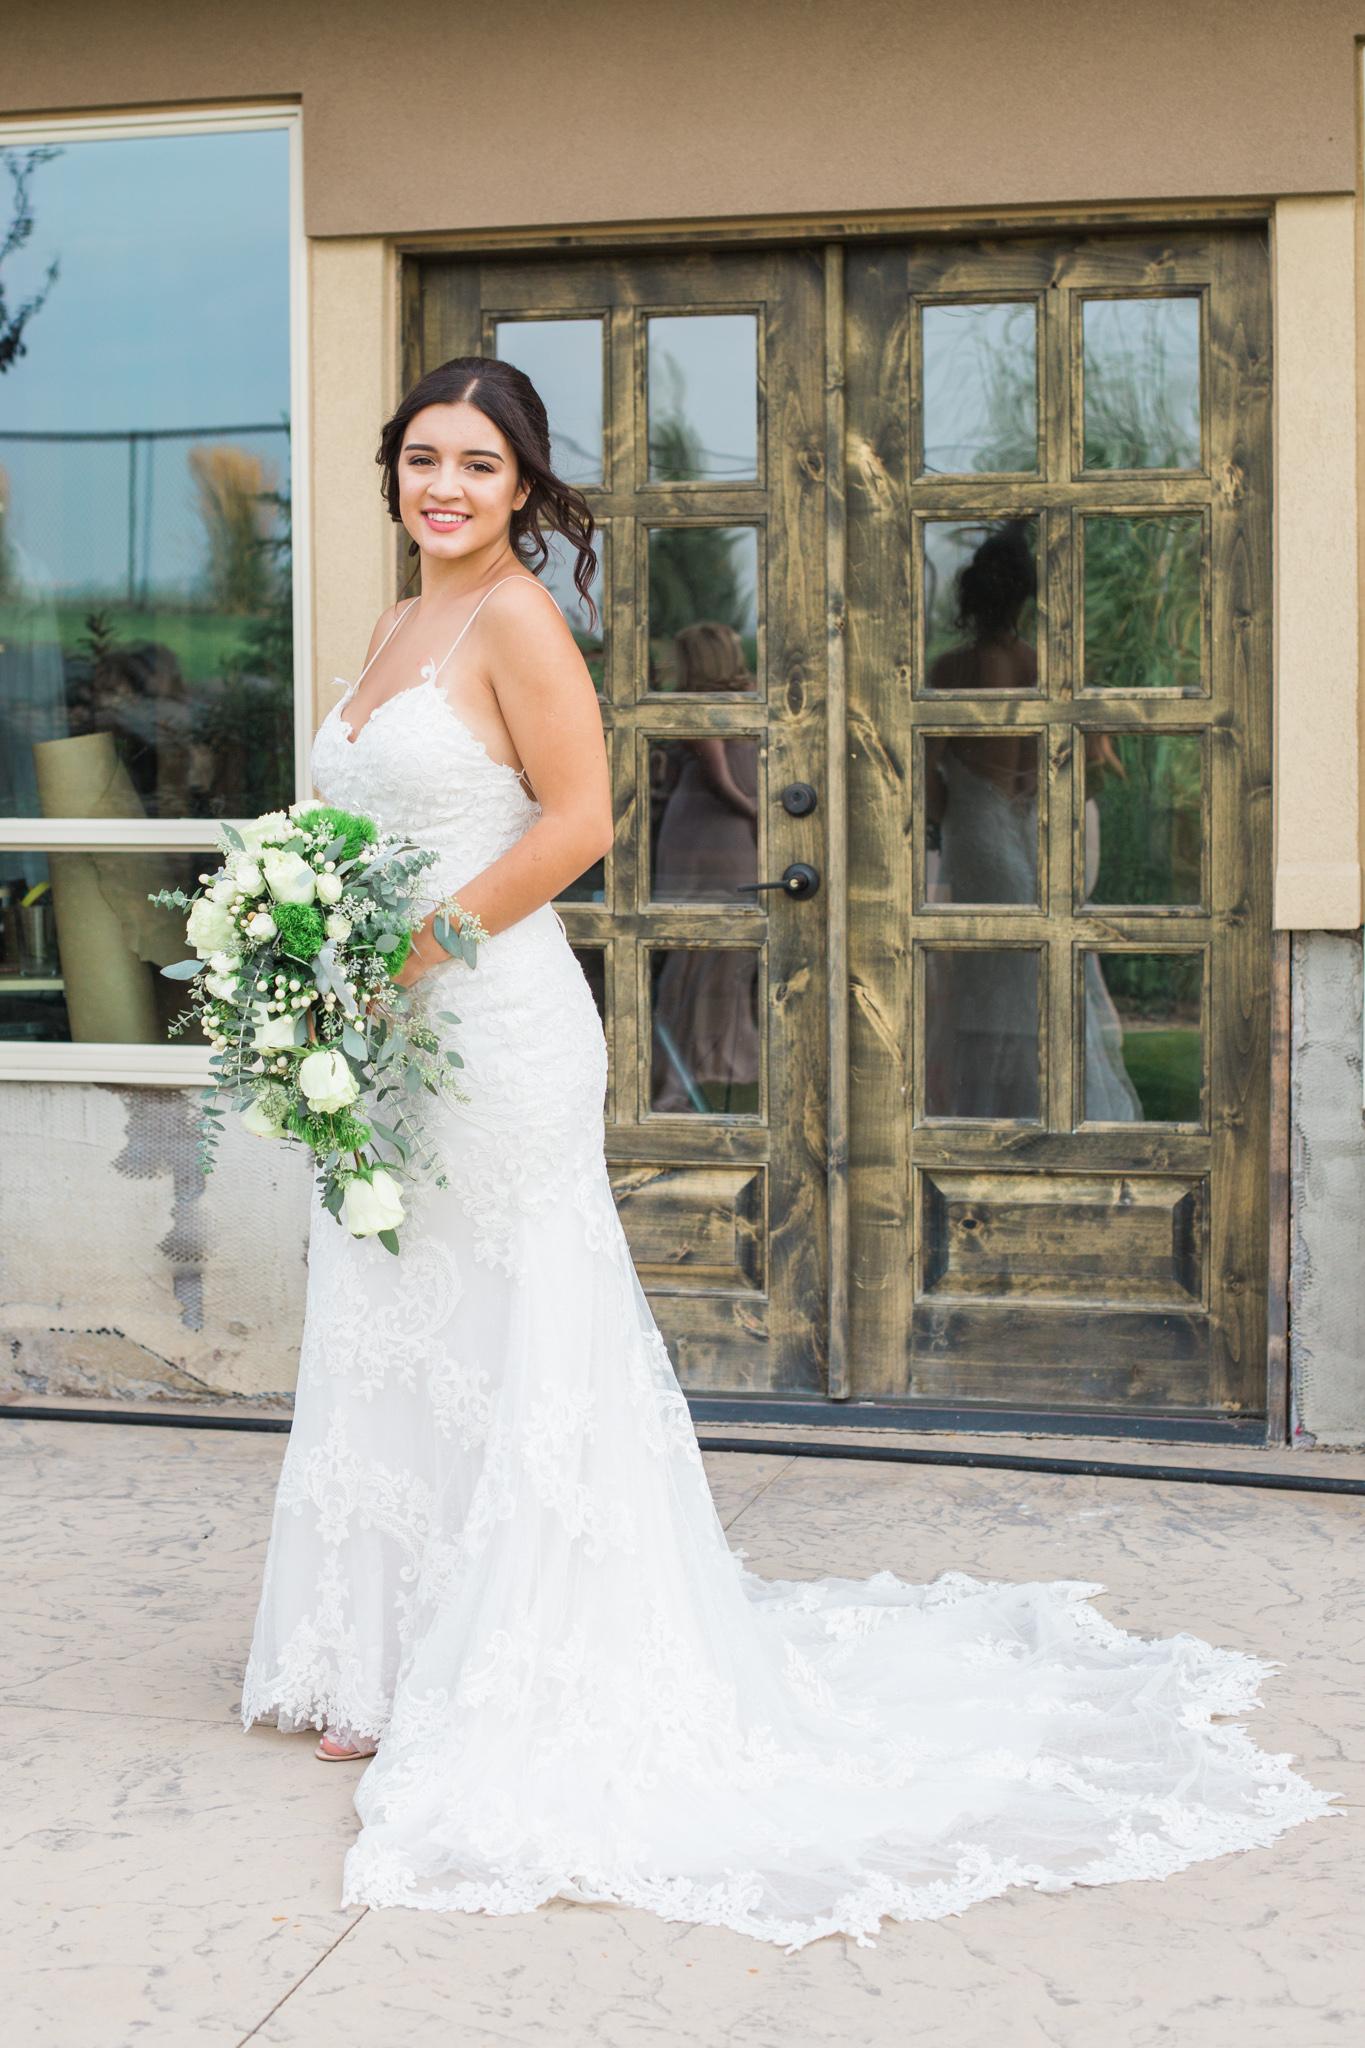 Olga_janni_wedding_090917_WEBSIZE (192 of 704).JPG